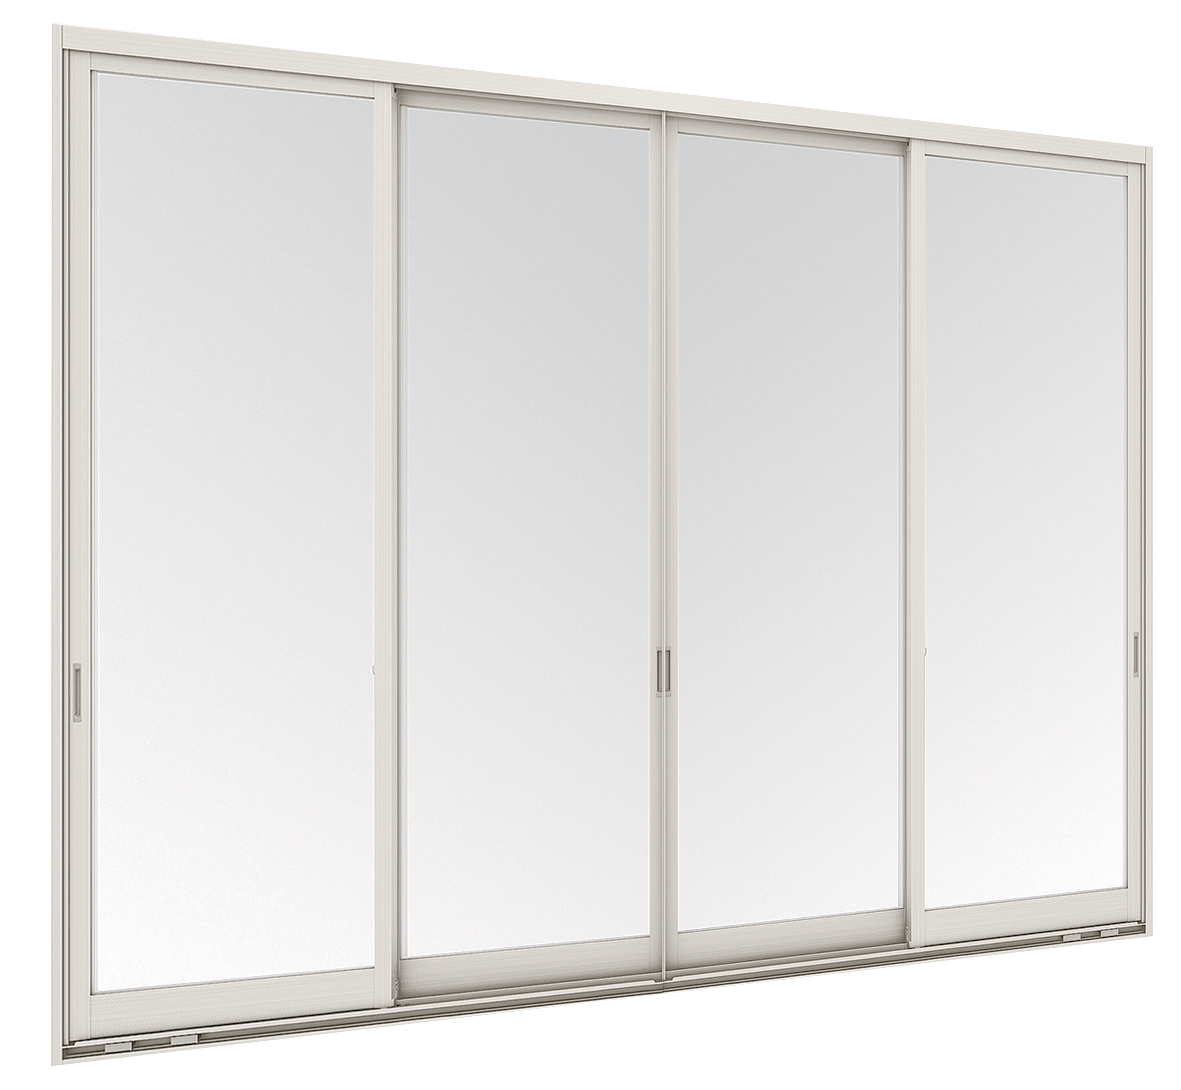 Aluminium Sliding window - 4 panels on 2 tracks